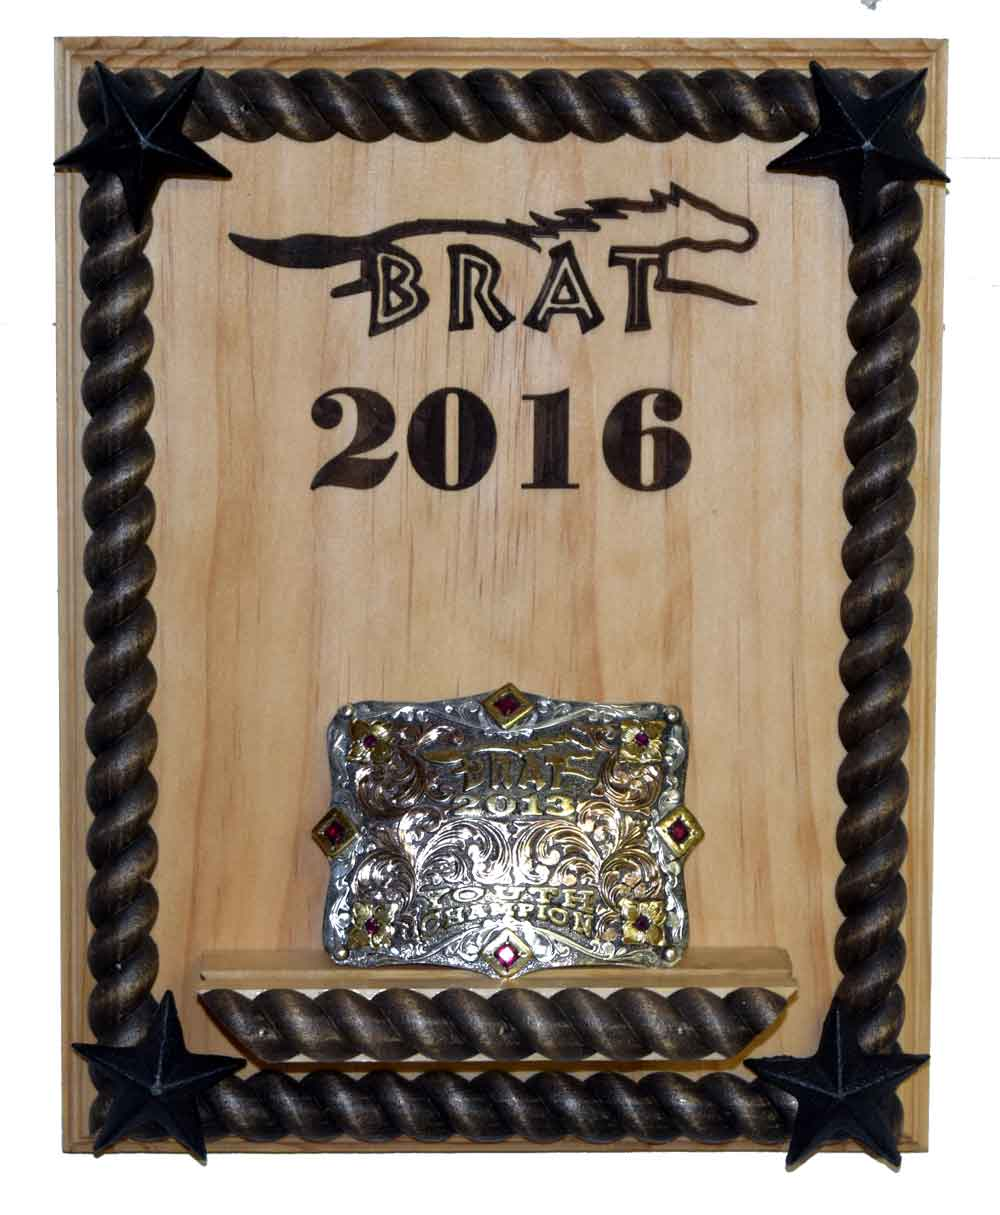 brat-plaque.jpg